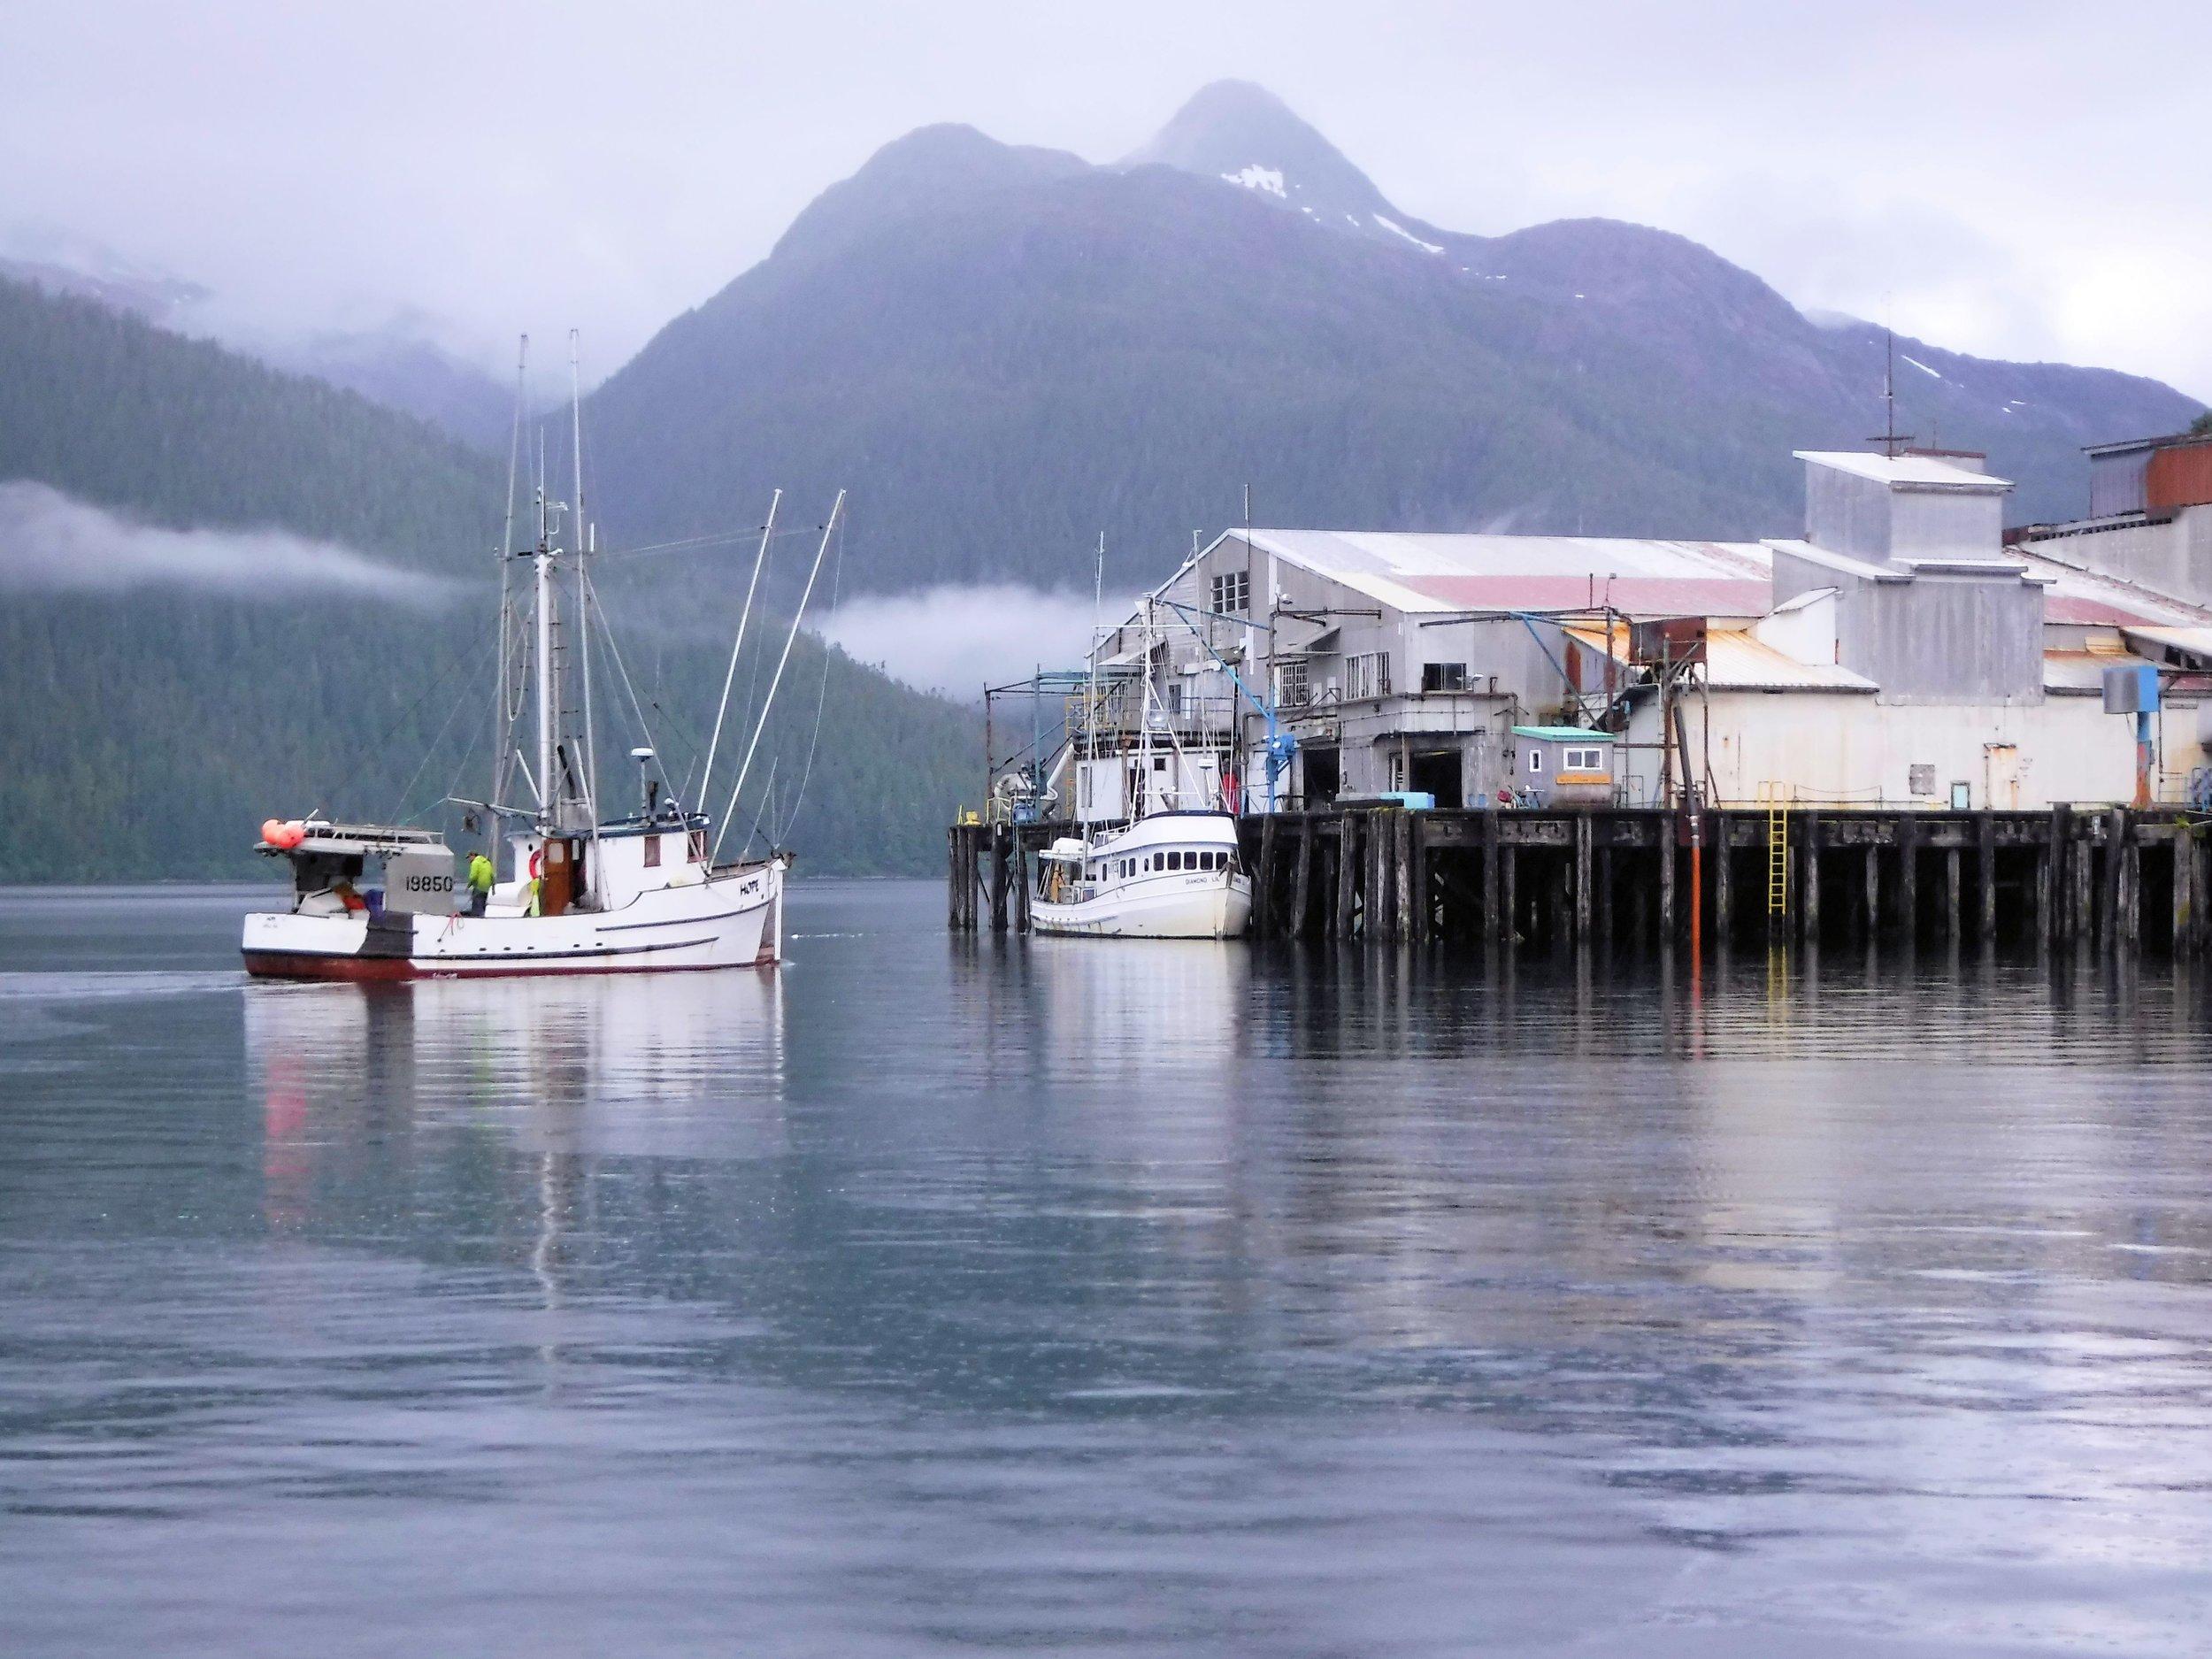 Fishing Boats in Pelican, Alaska